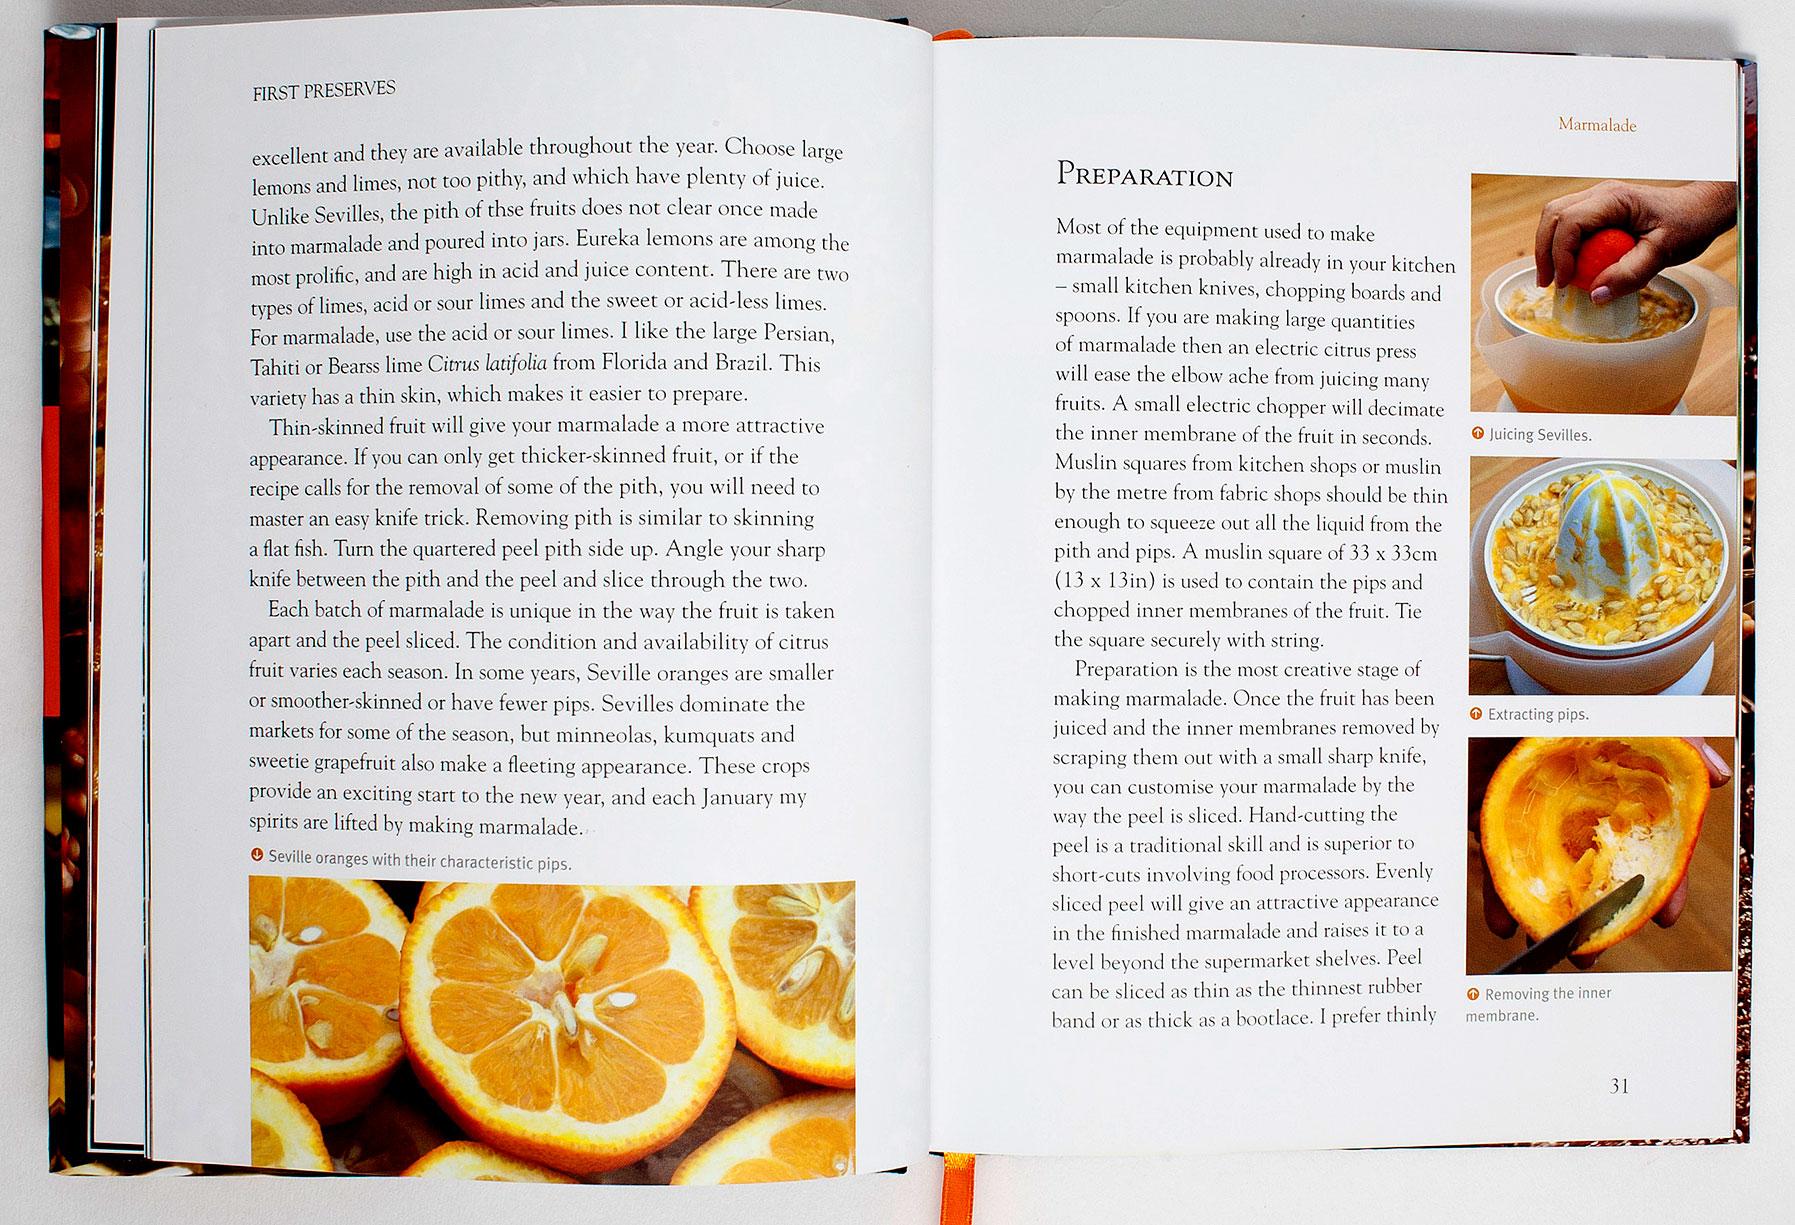 epm-print-management-cookery-books-4.jpg